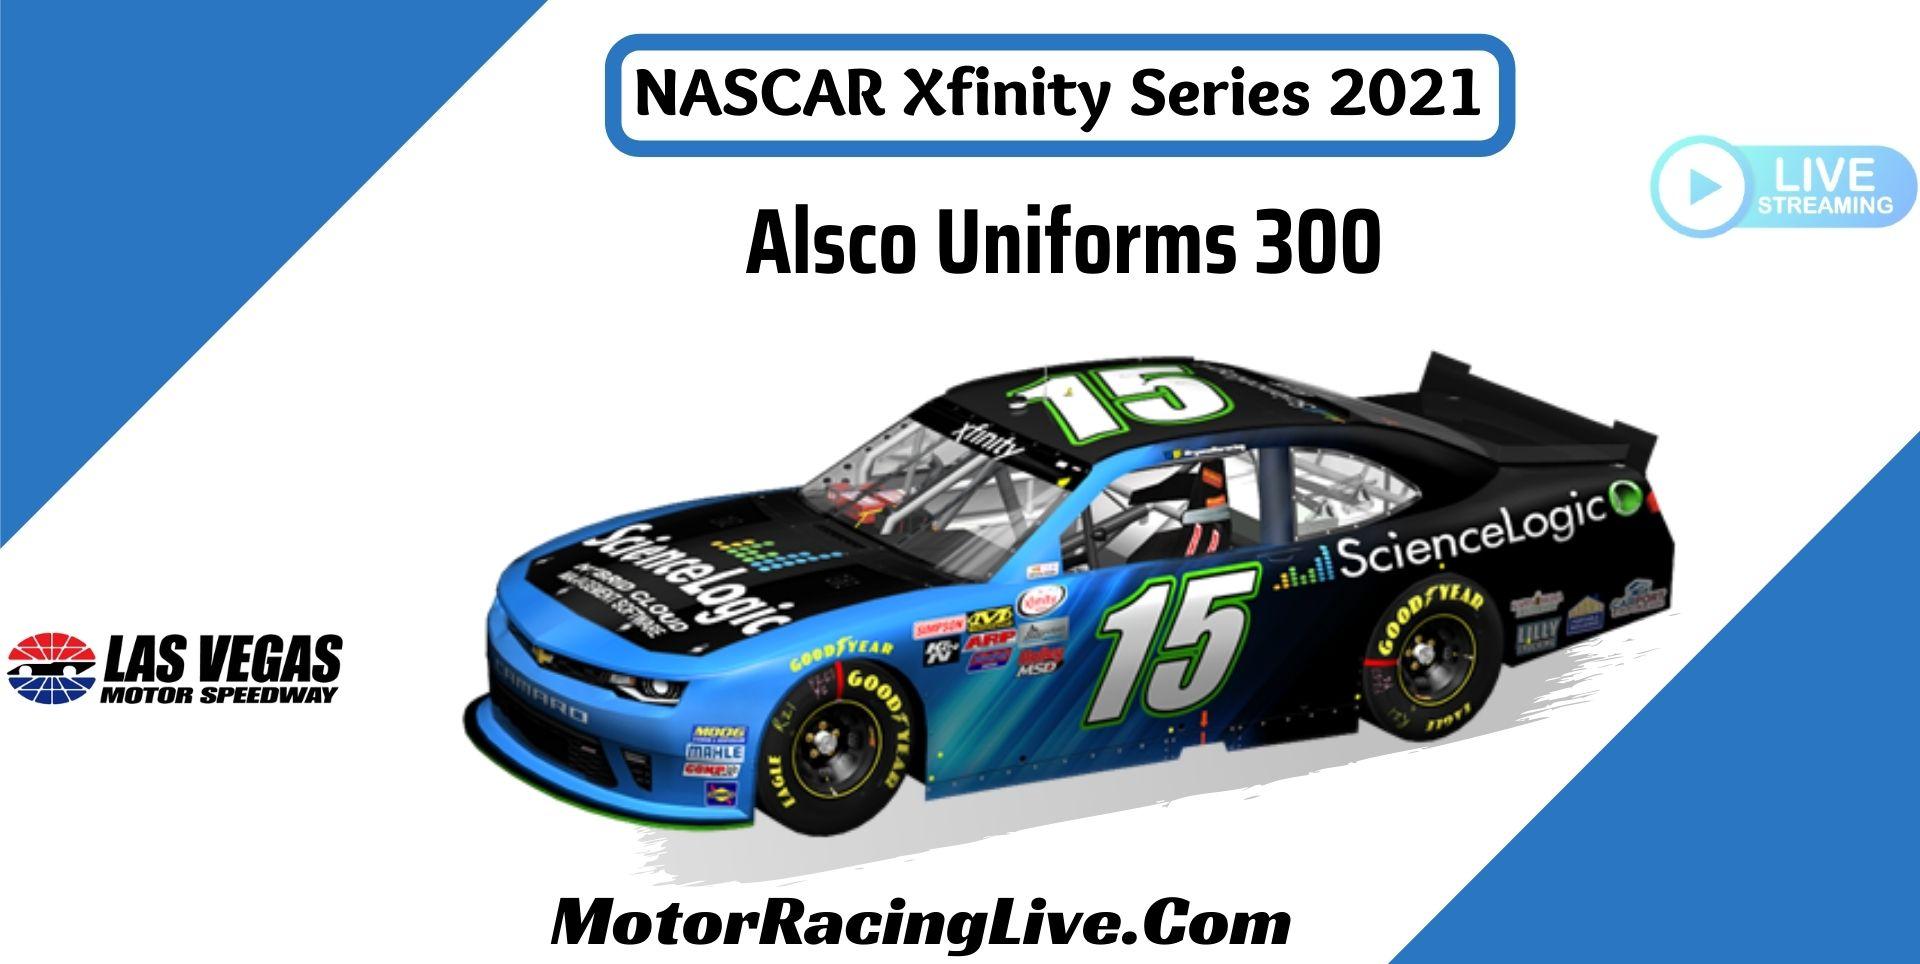 Alsco Uniforms 300 NASCAR Xfinity 2021 Live Stream